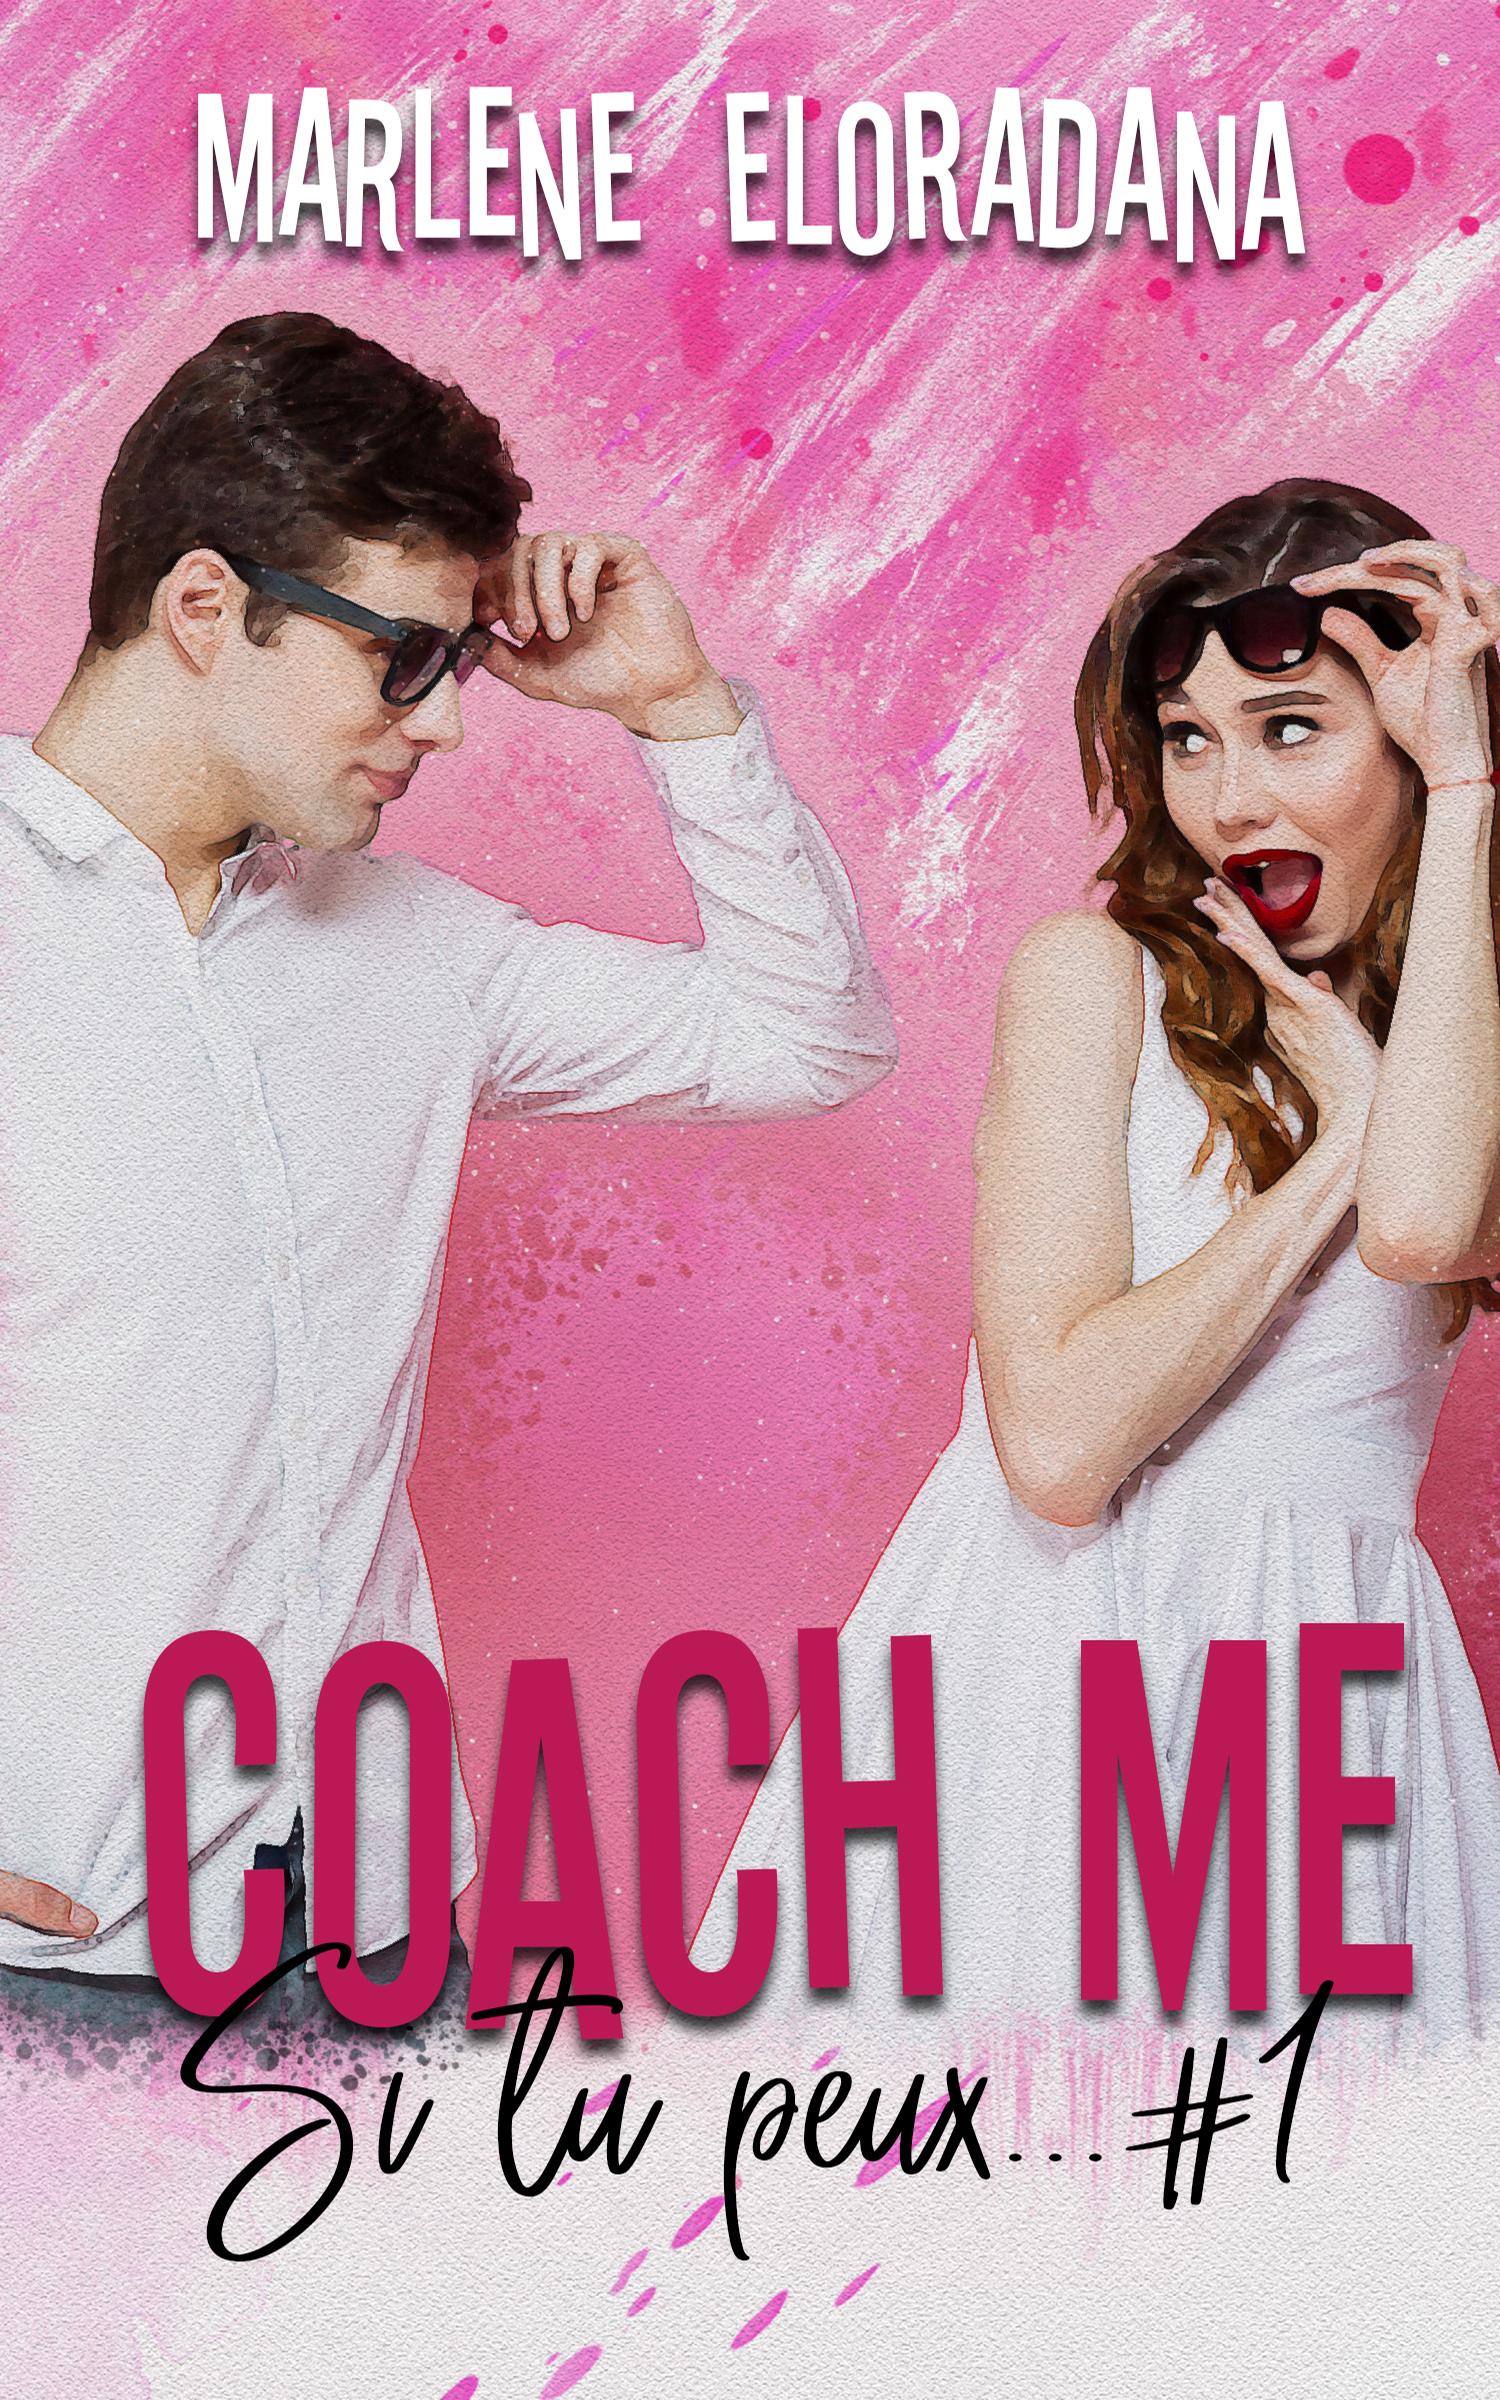 Coach me, si tu peux #1 de Marlène Eloradana